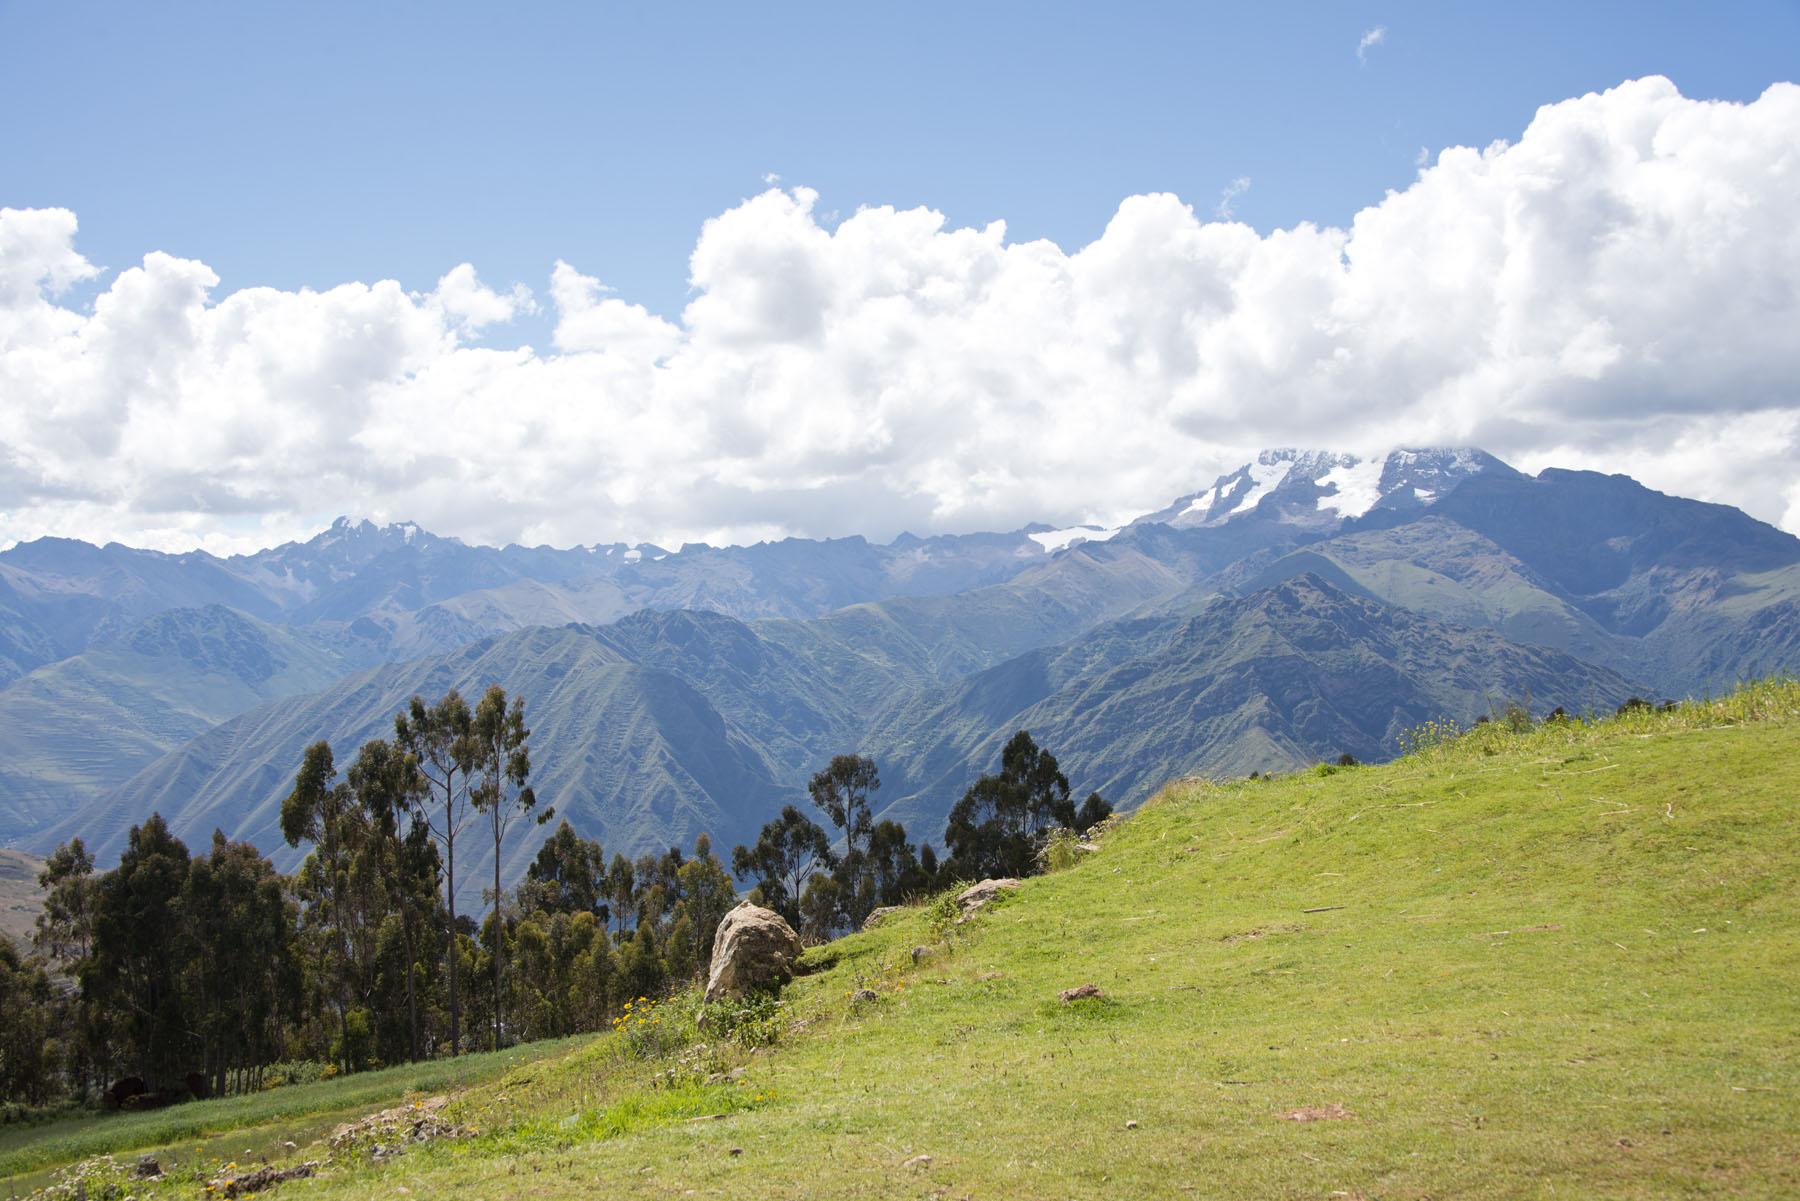 106-Peru-5-15.jpg